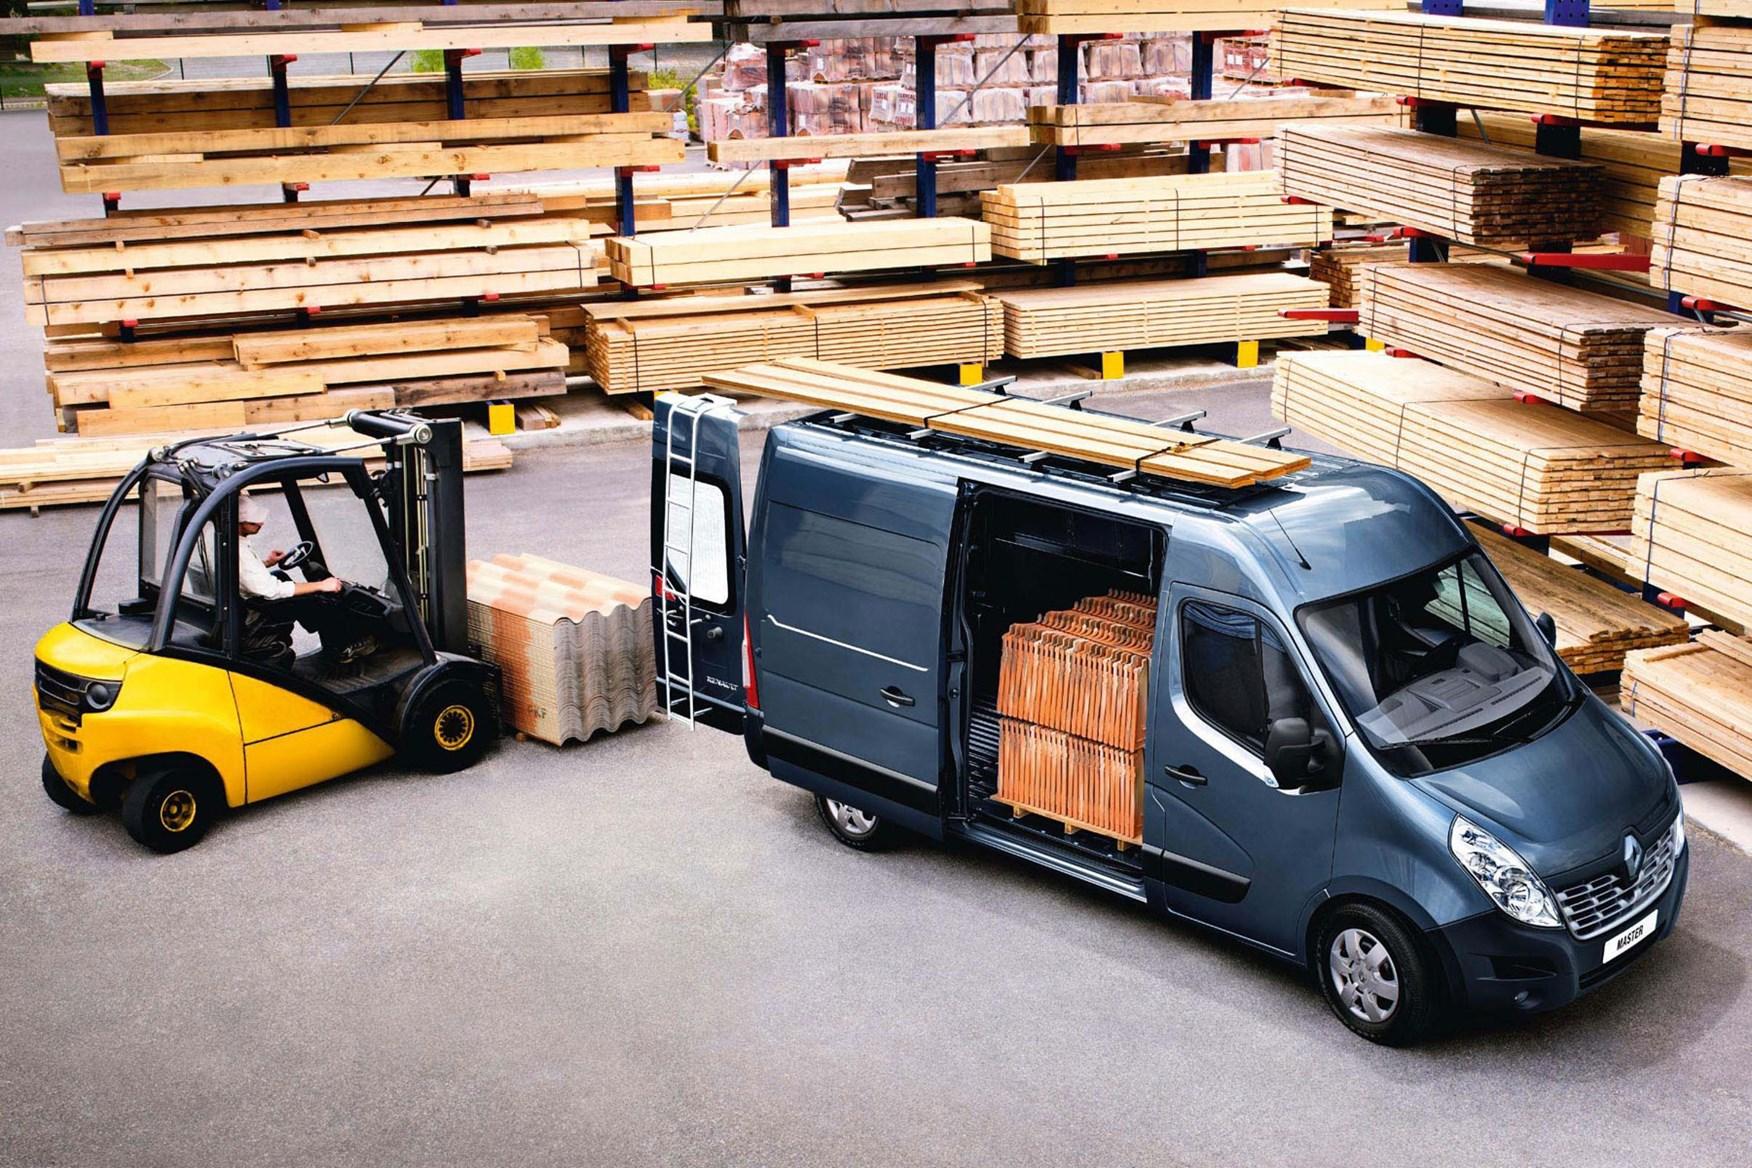 Renault Master van dimensions (2010-on), capacity, payload, volume